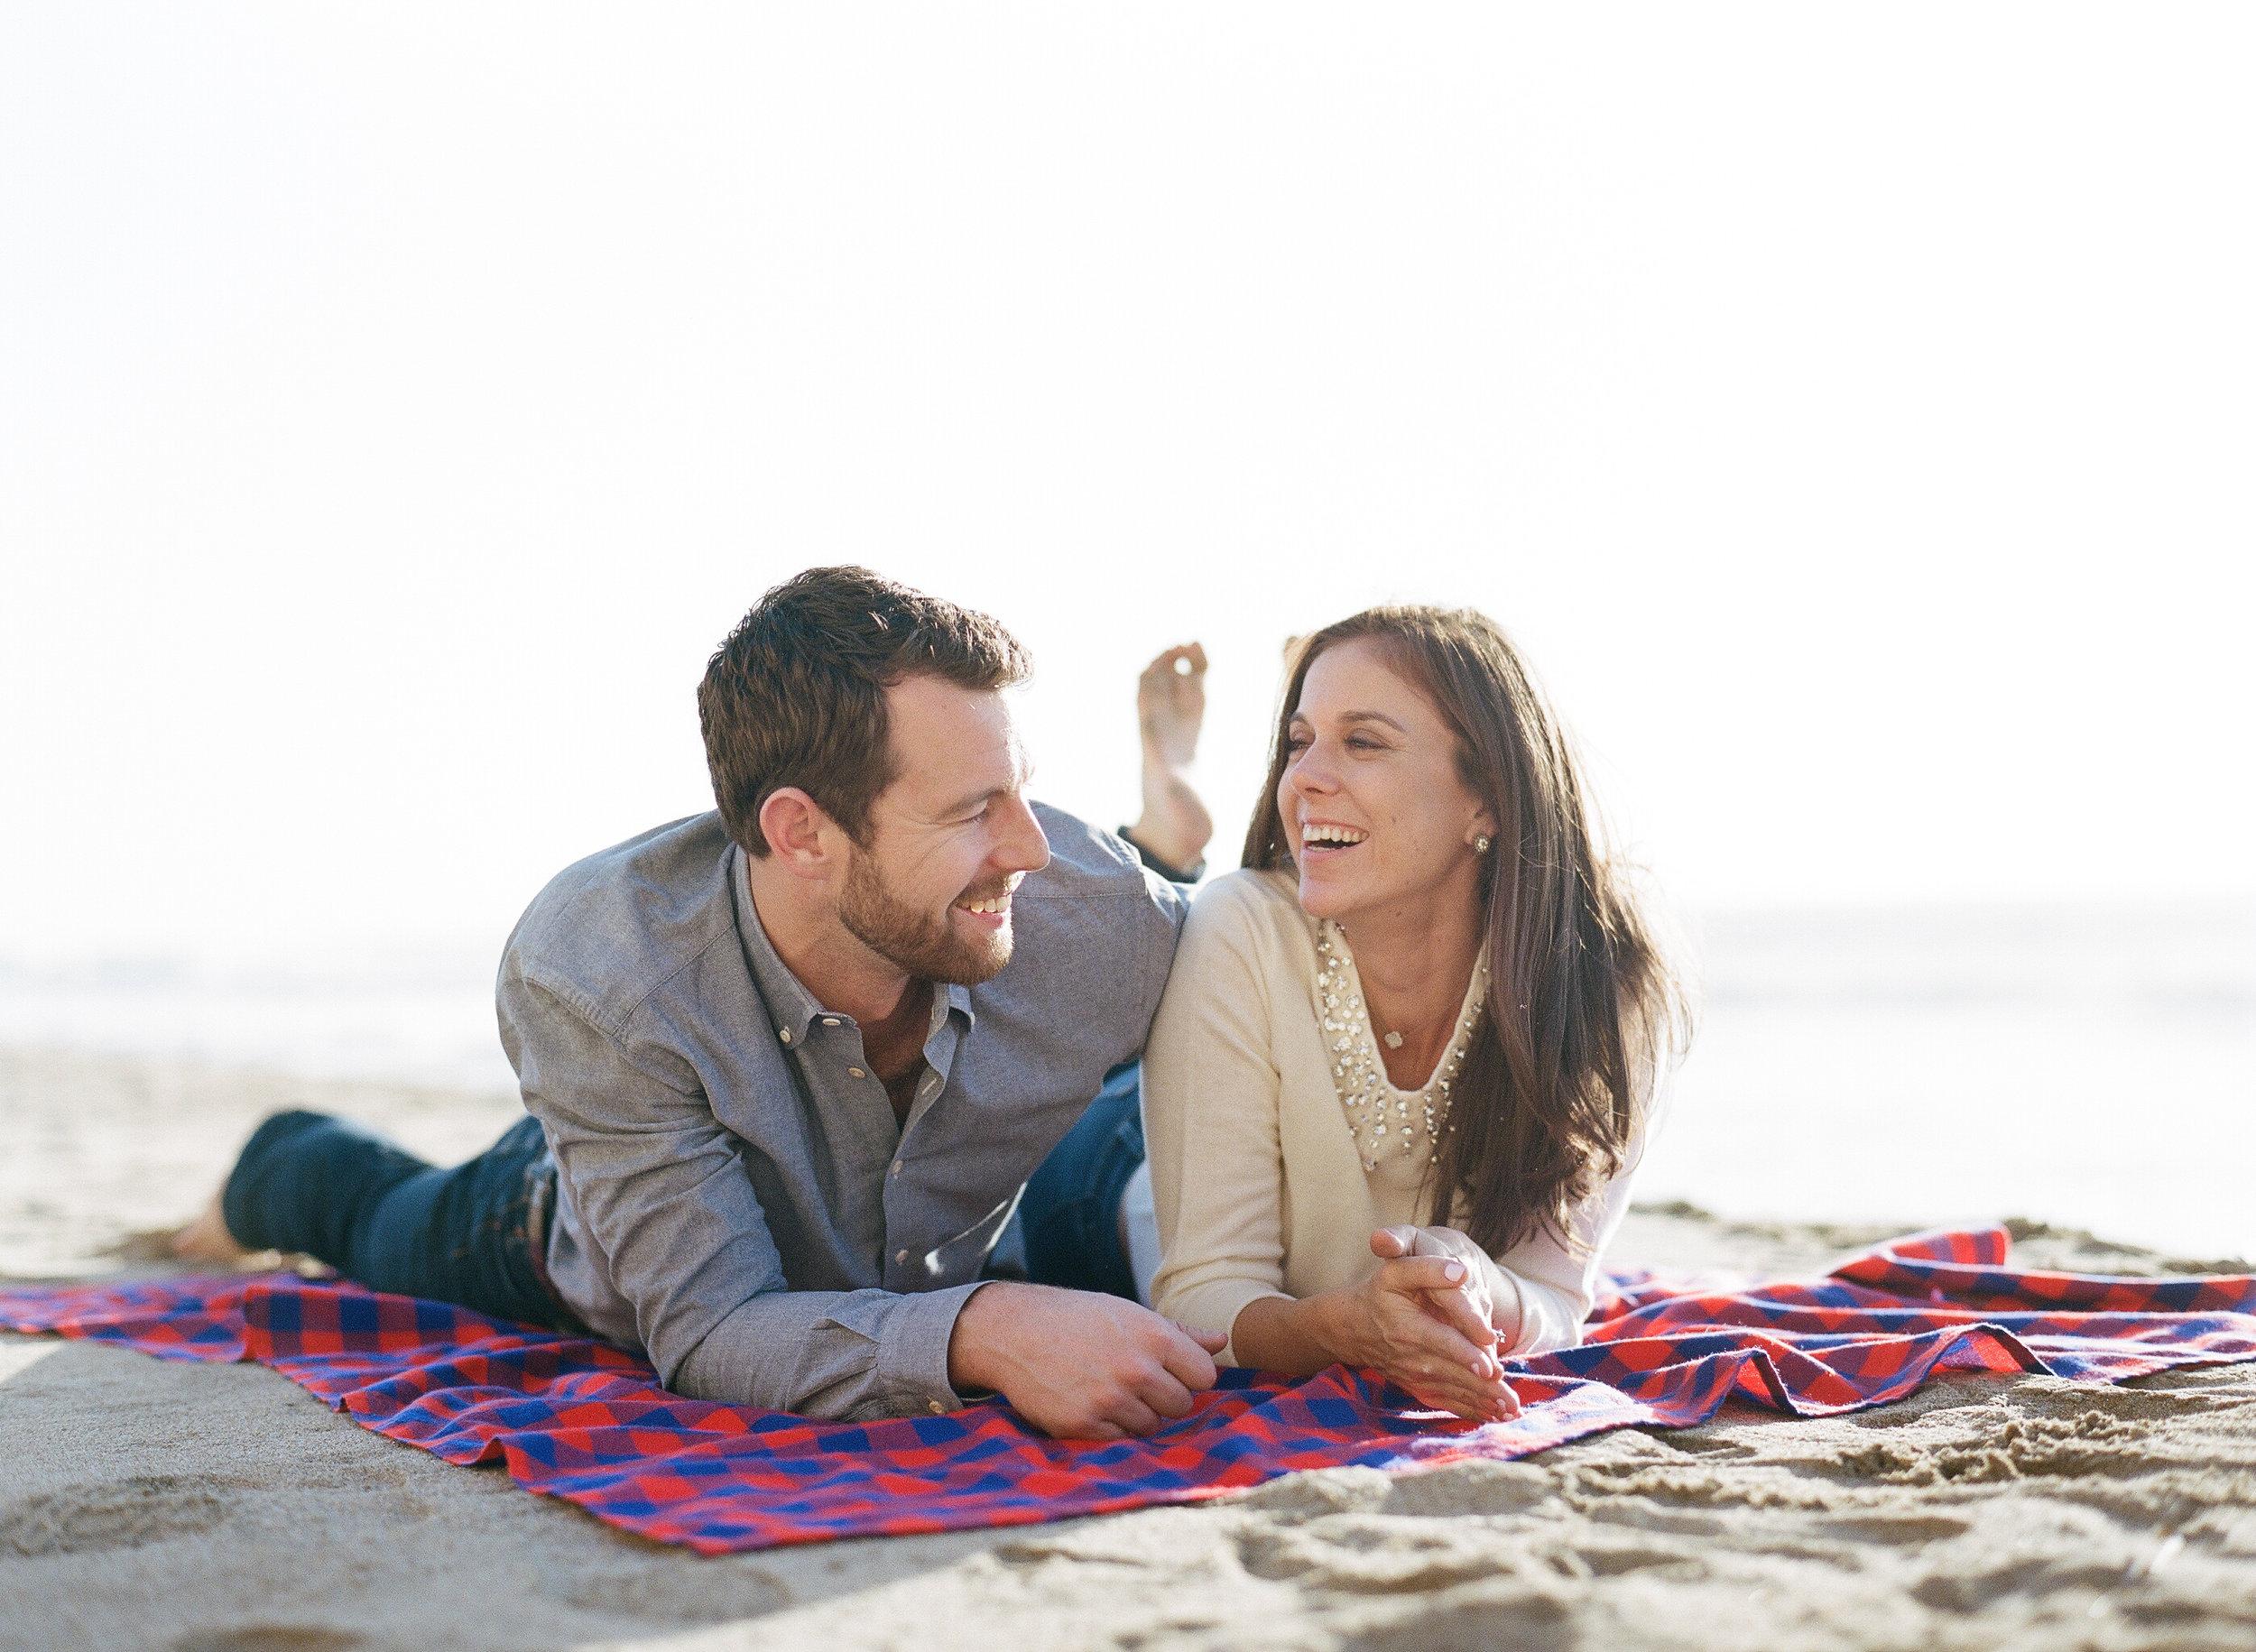 Couple laughing on beach blanket, Northern California beach; Sylvie Gil Photography